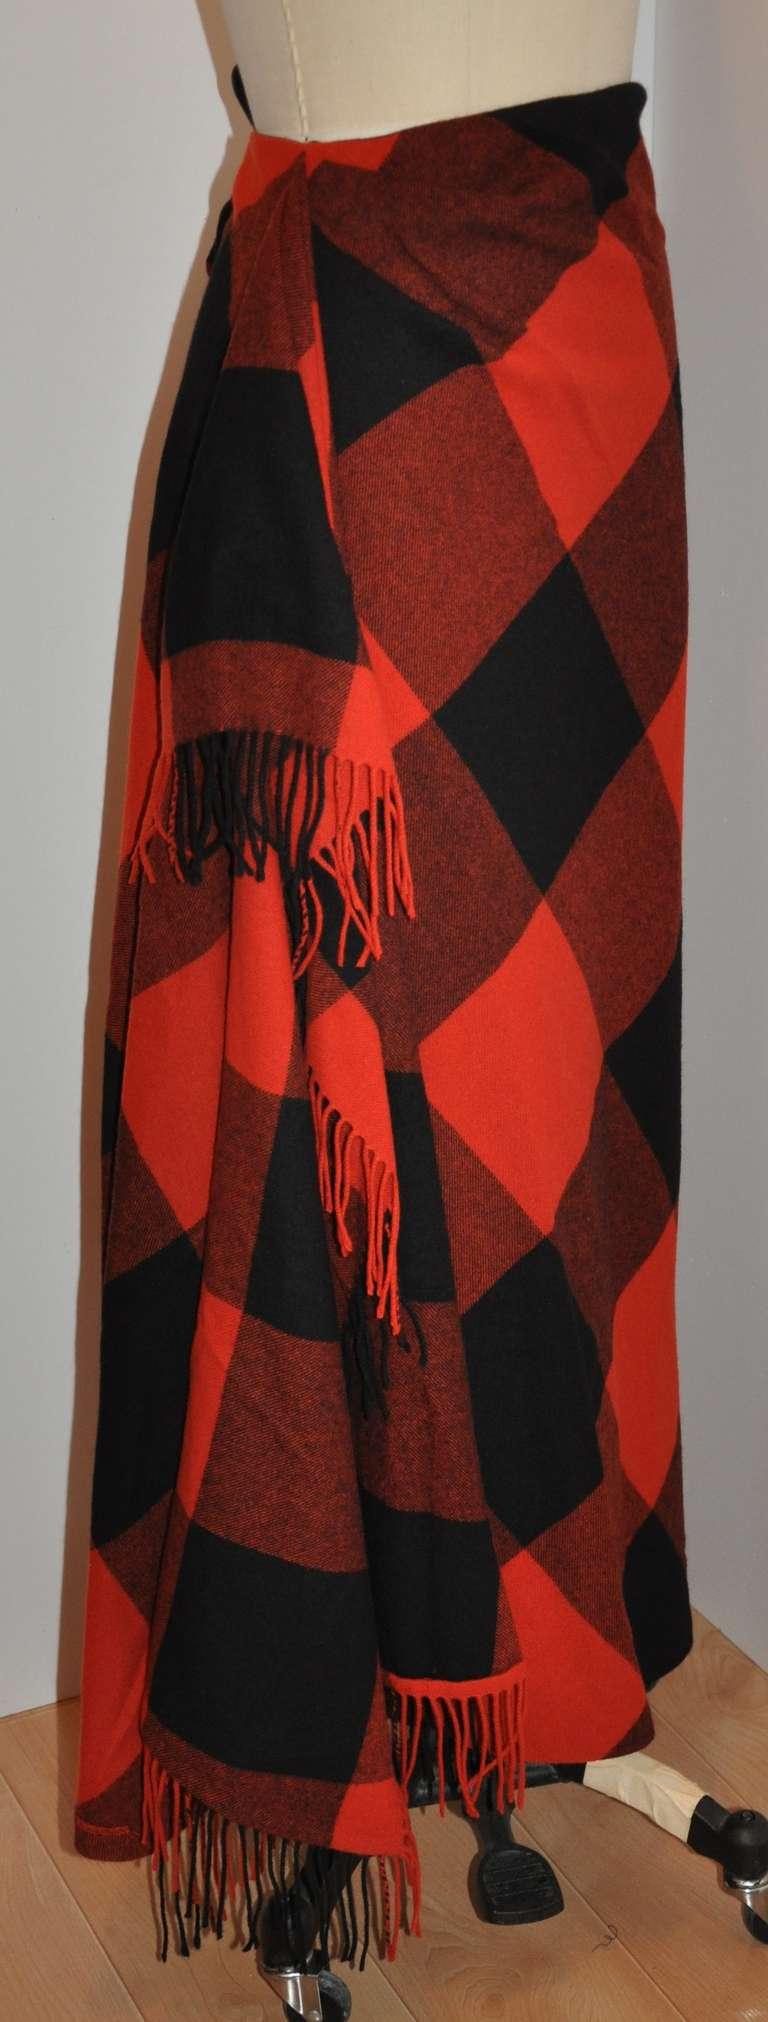 Ralph Lauren Fringed Red & Black Checkered Maxi Skirt 2